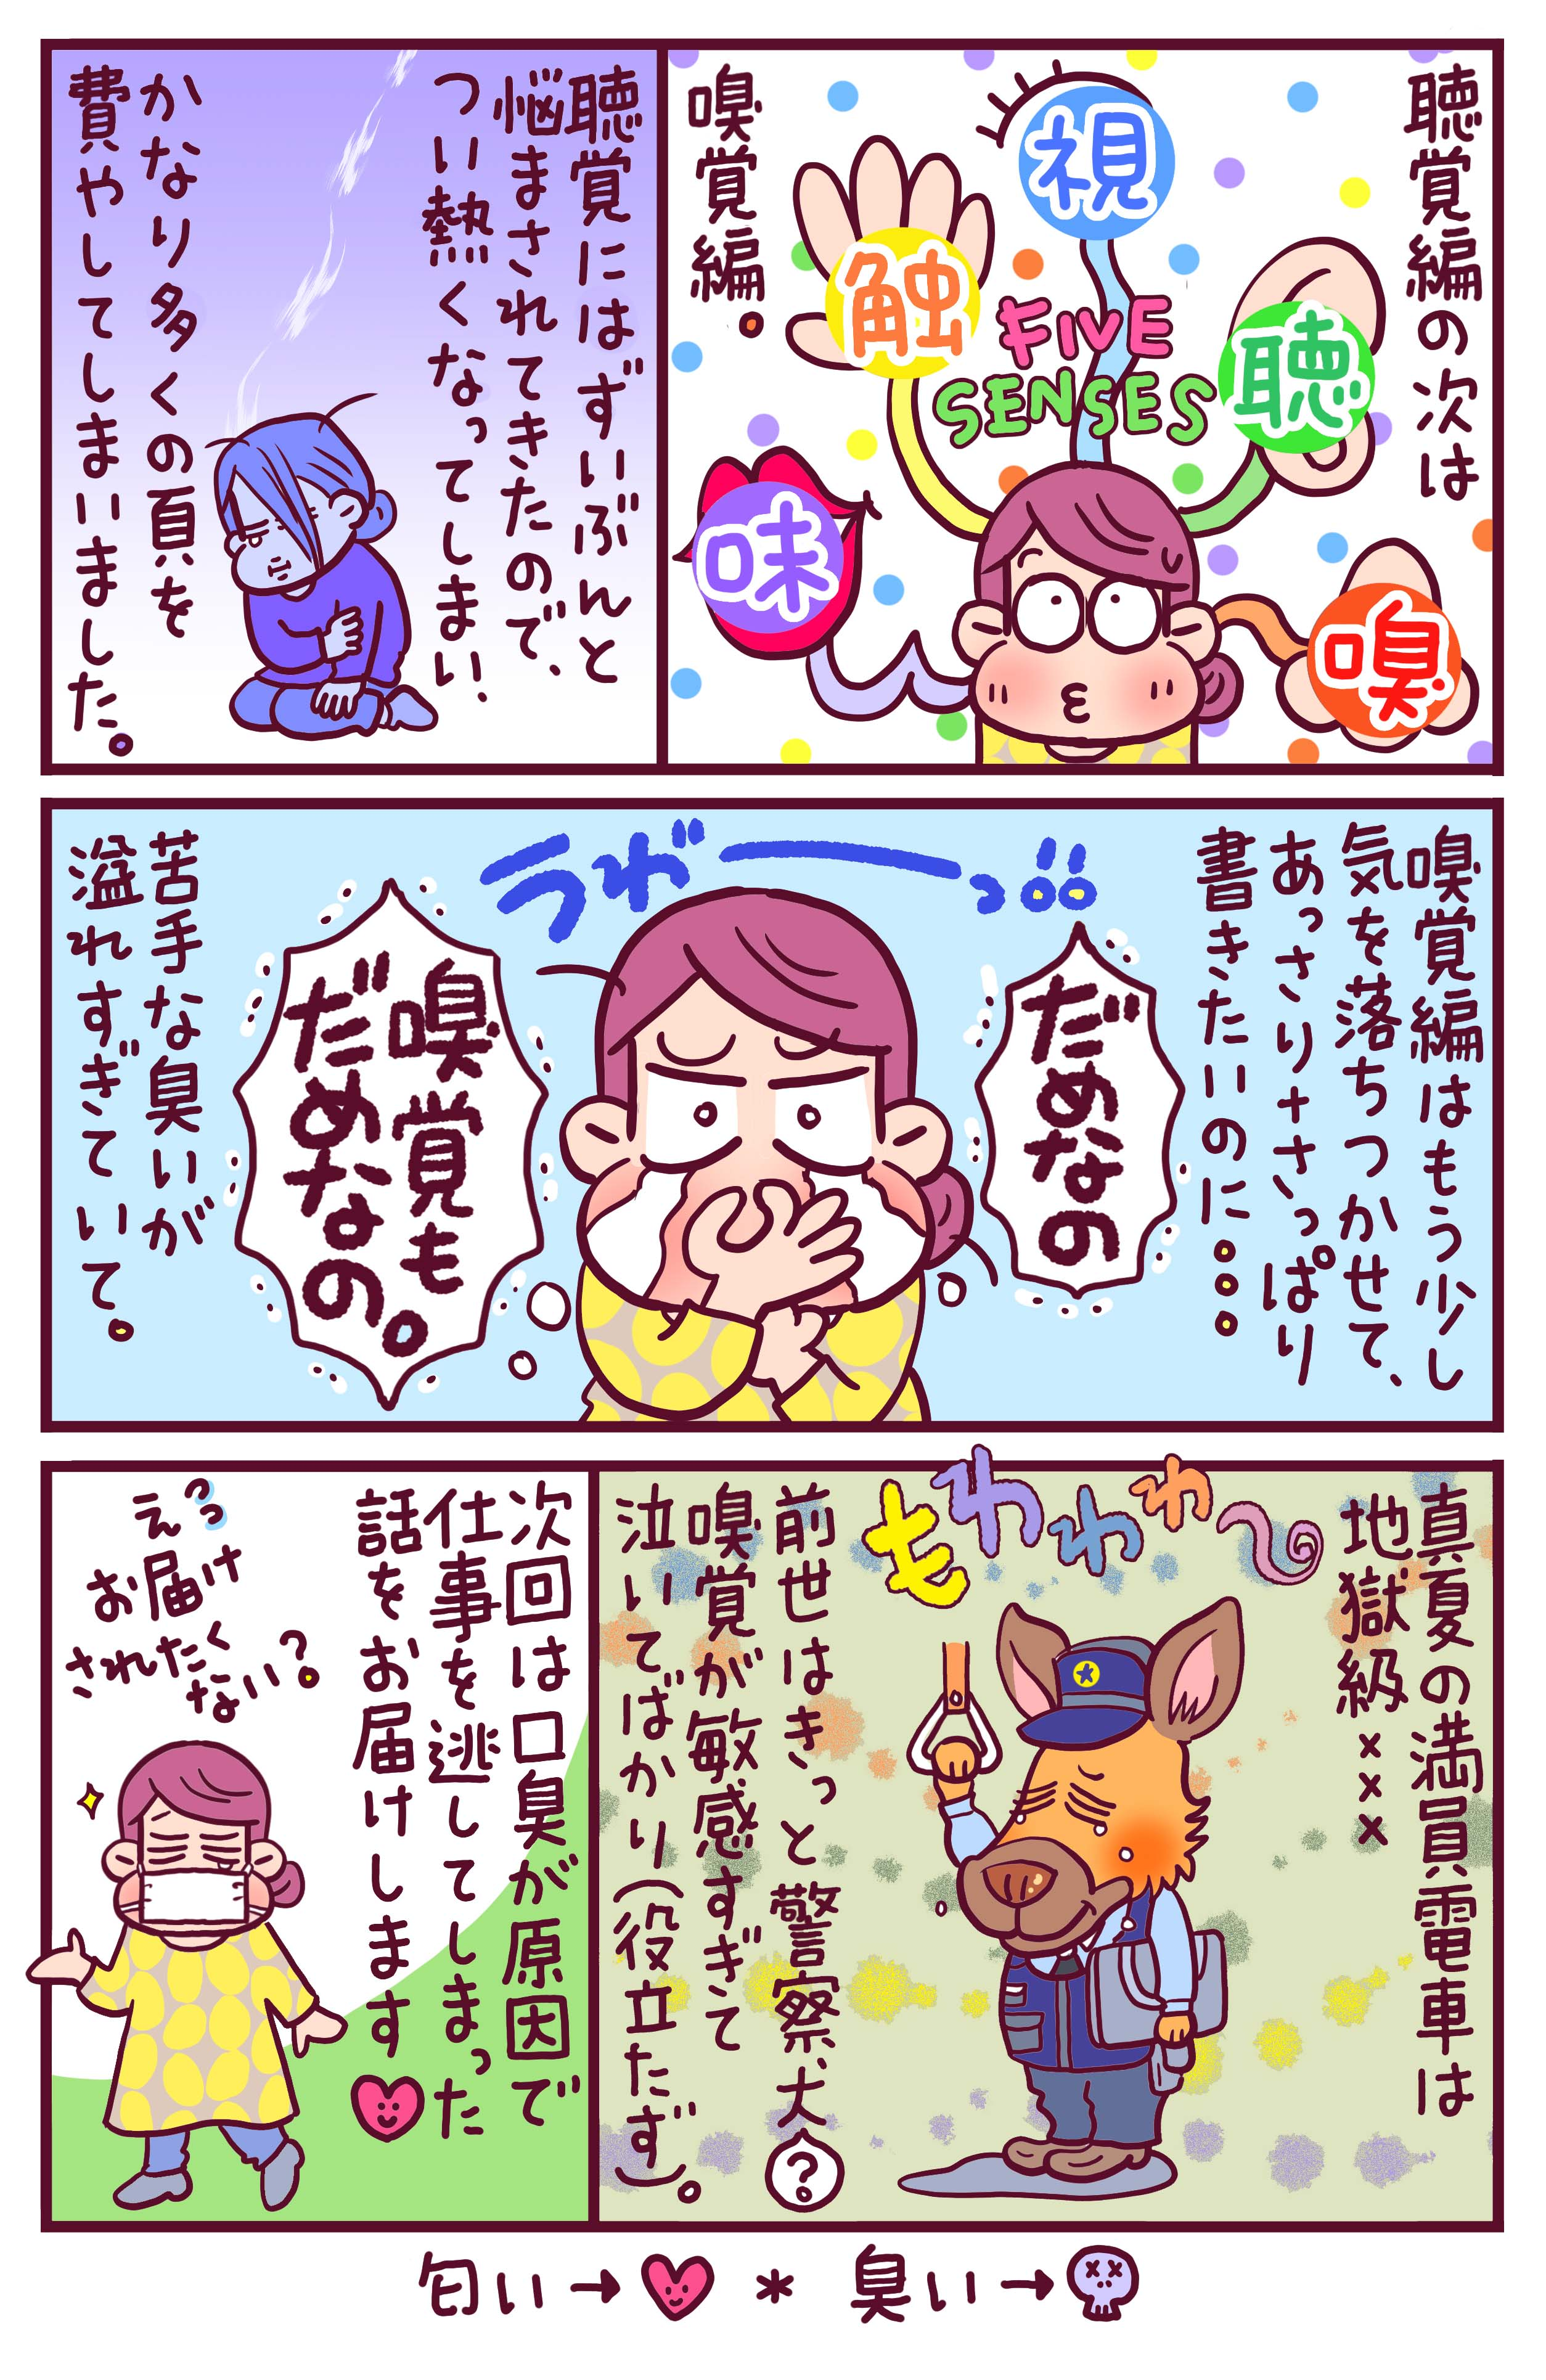 HSPマンガエッセイ(高野優)嗅覚